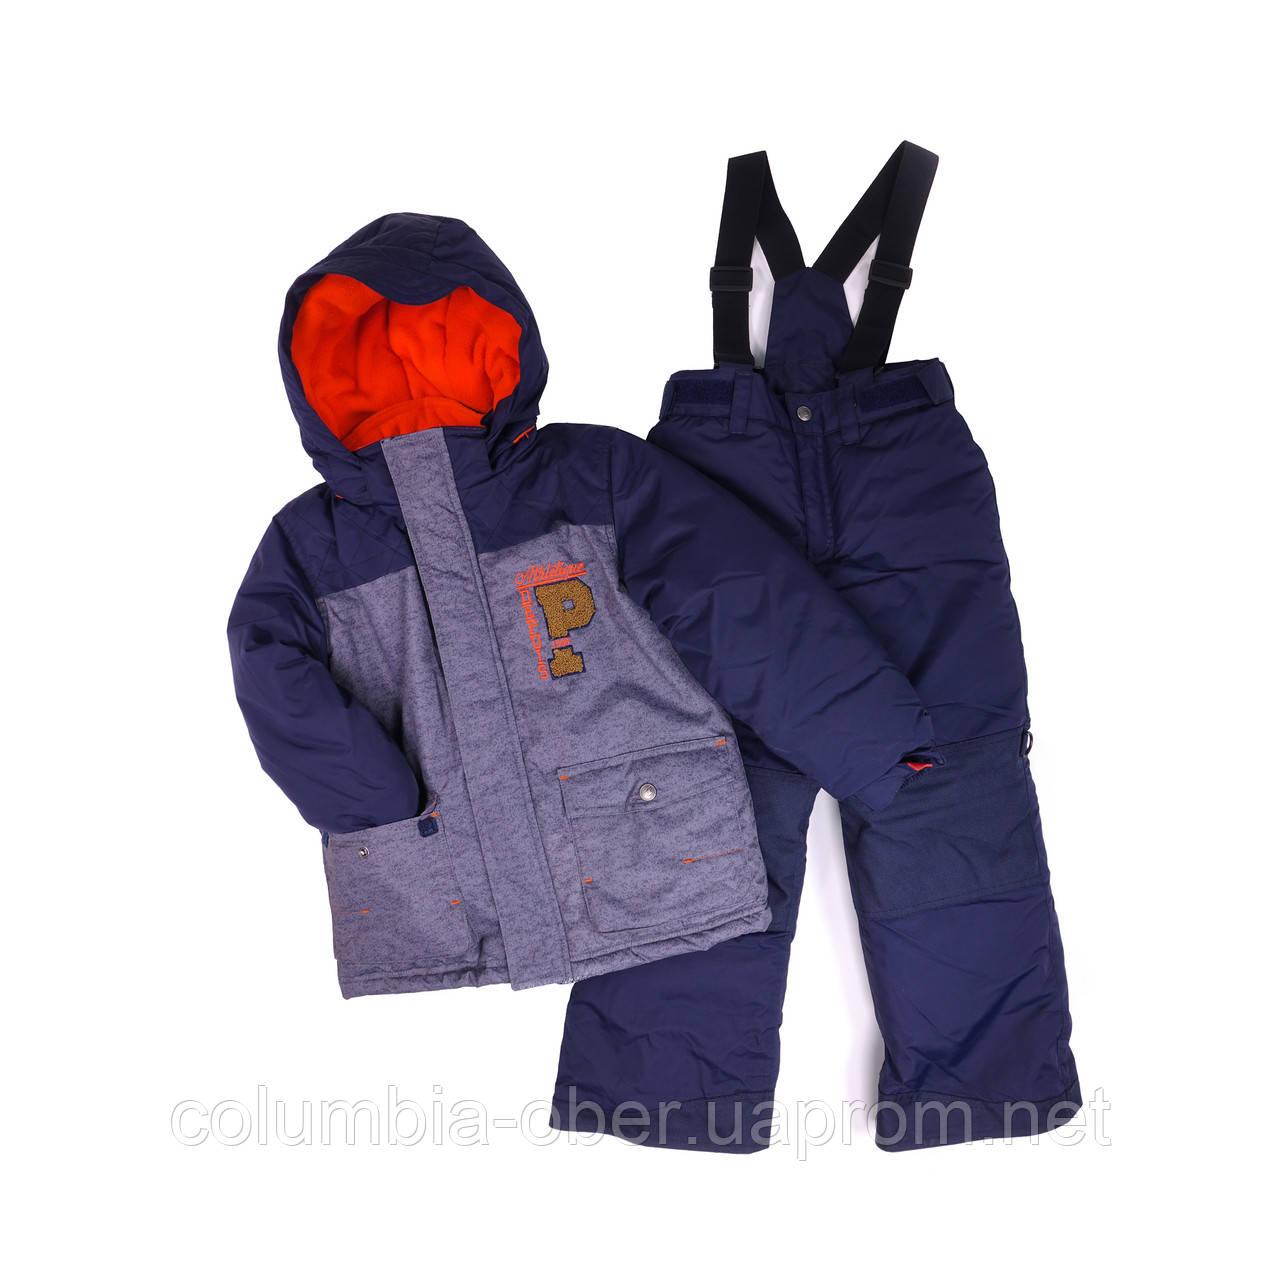 Зимний костюм для мальчика PELUCHE 79 EG M F16 Smoke. Размер 119 и 135.